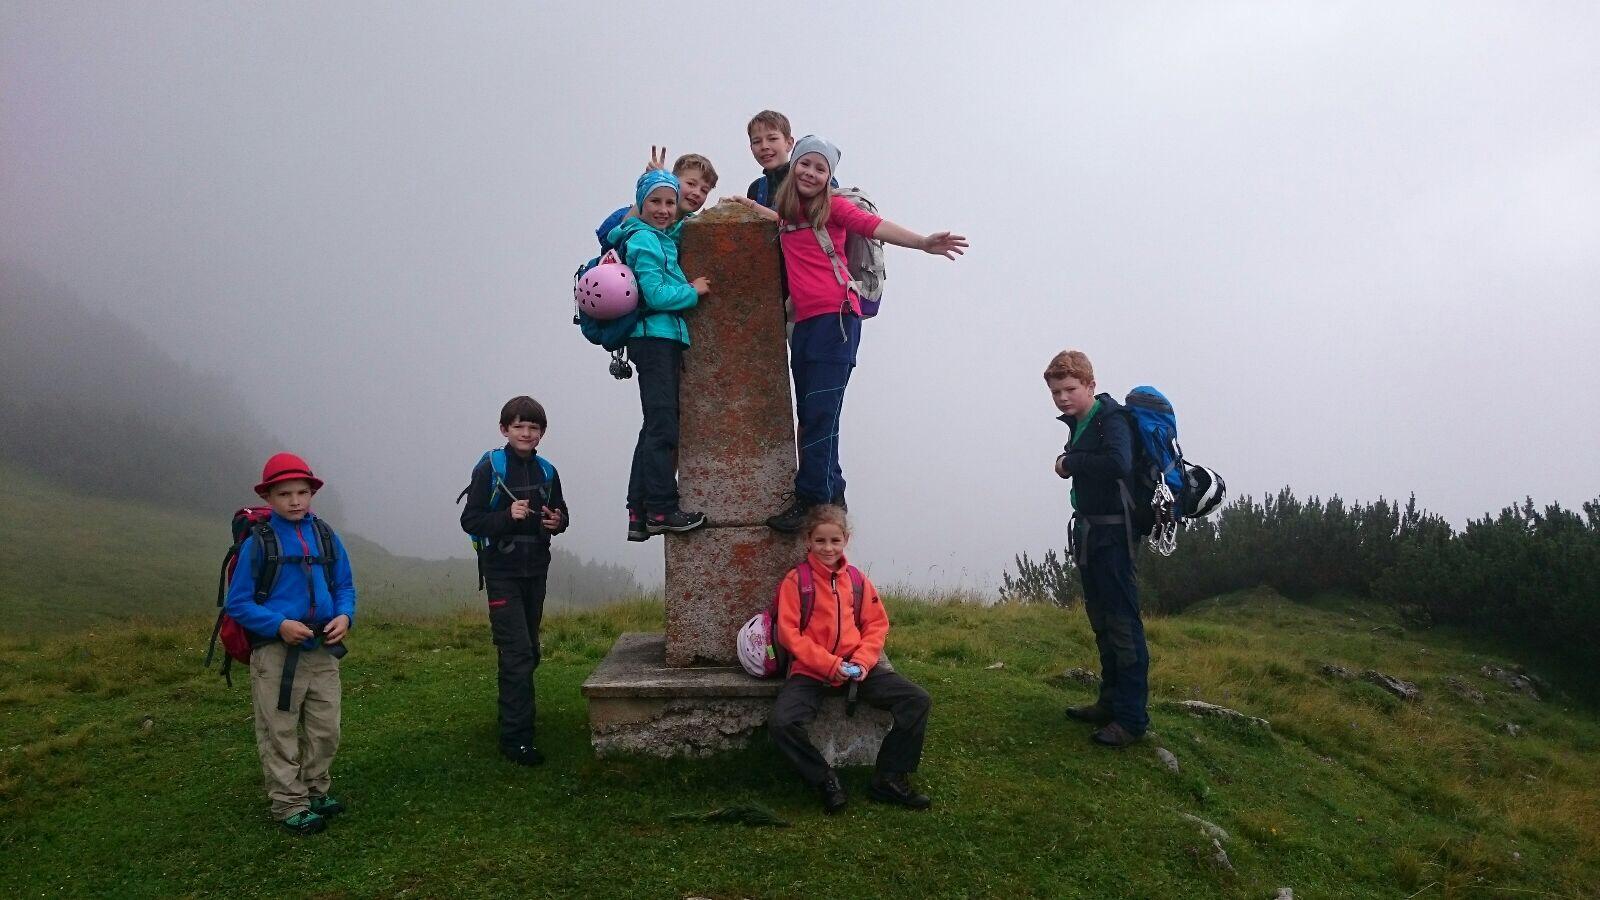 Familiengruppe: Wanderung